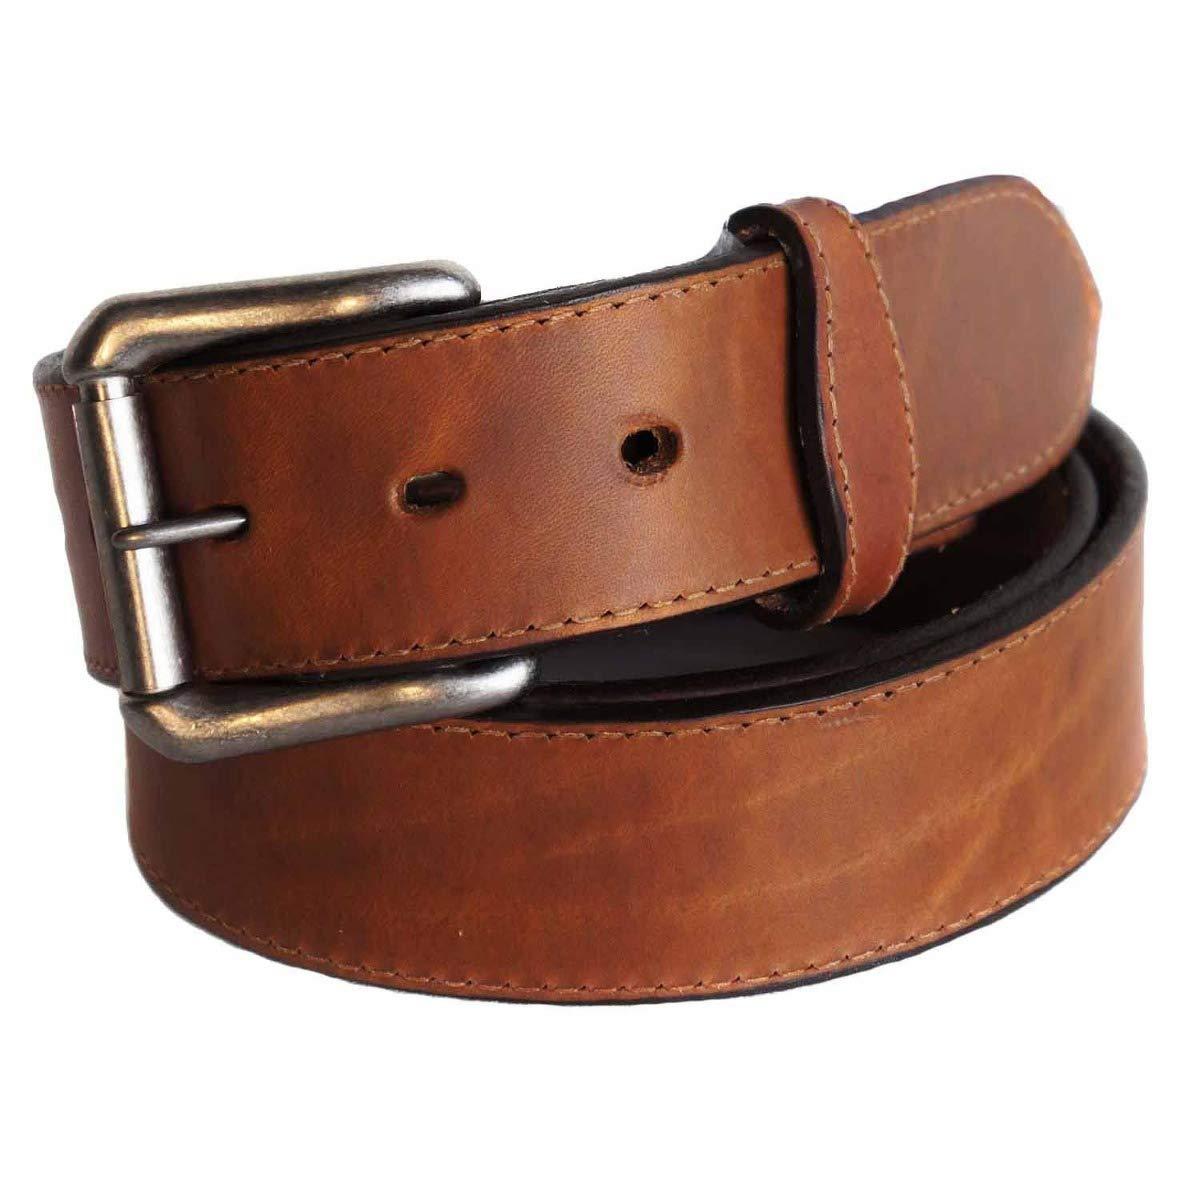 9989b9cb153e R bullco usa made jpg 1200x1200 Police belts tan oil